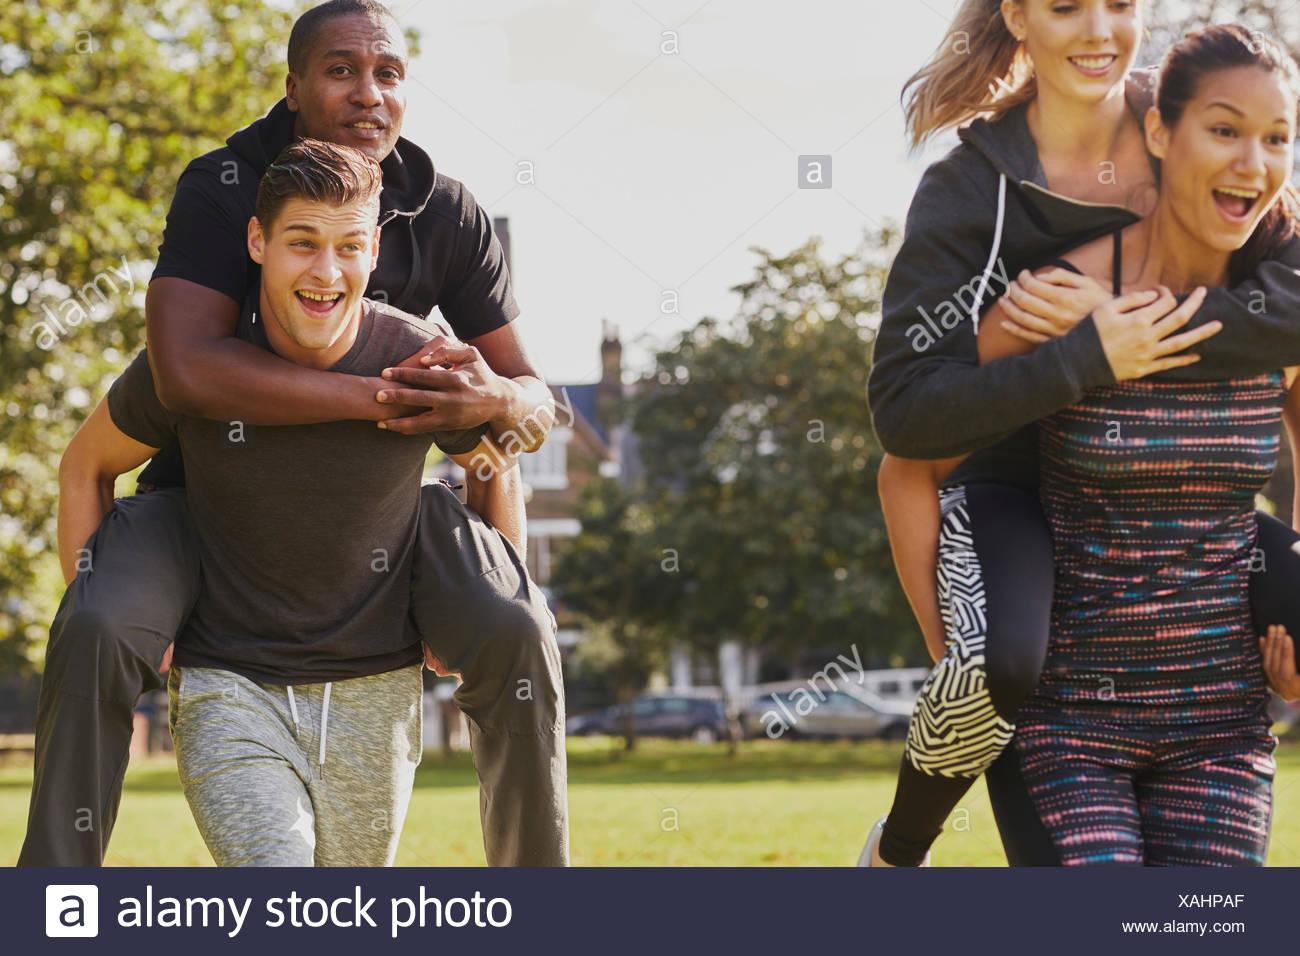 Men and women having fun training in park, having piggy back  race - Stock Image